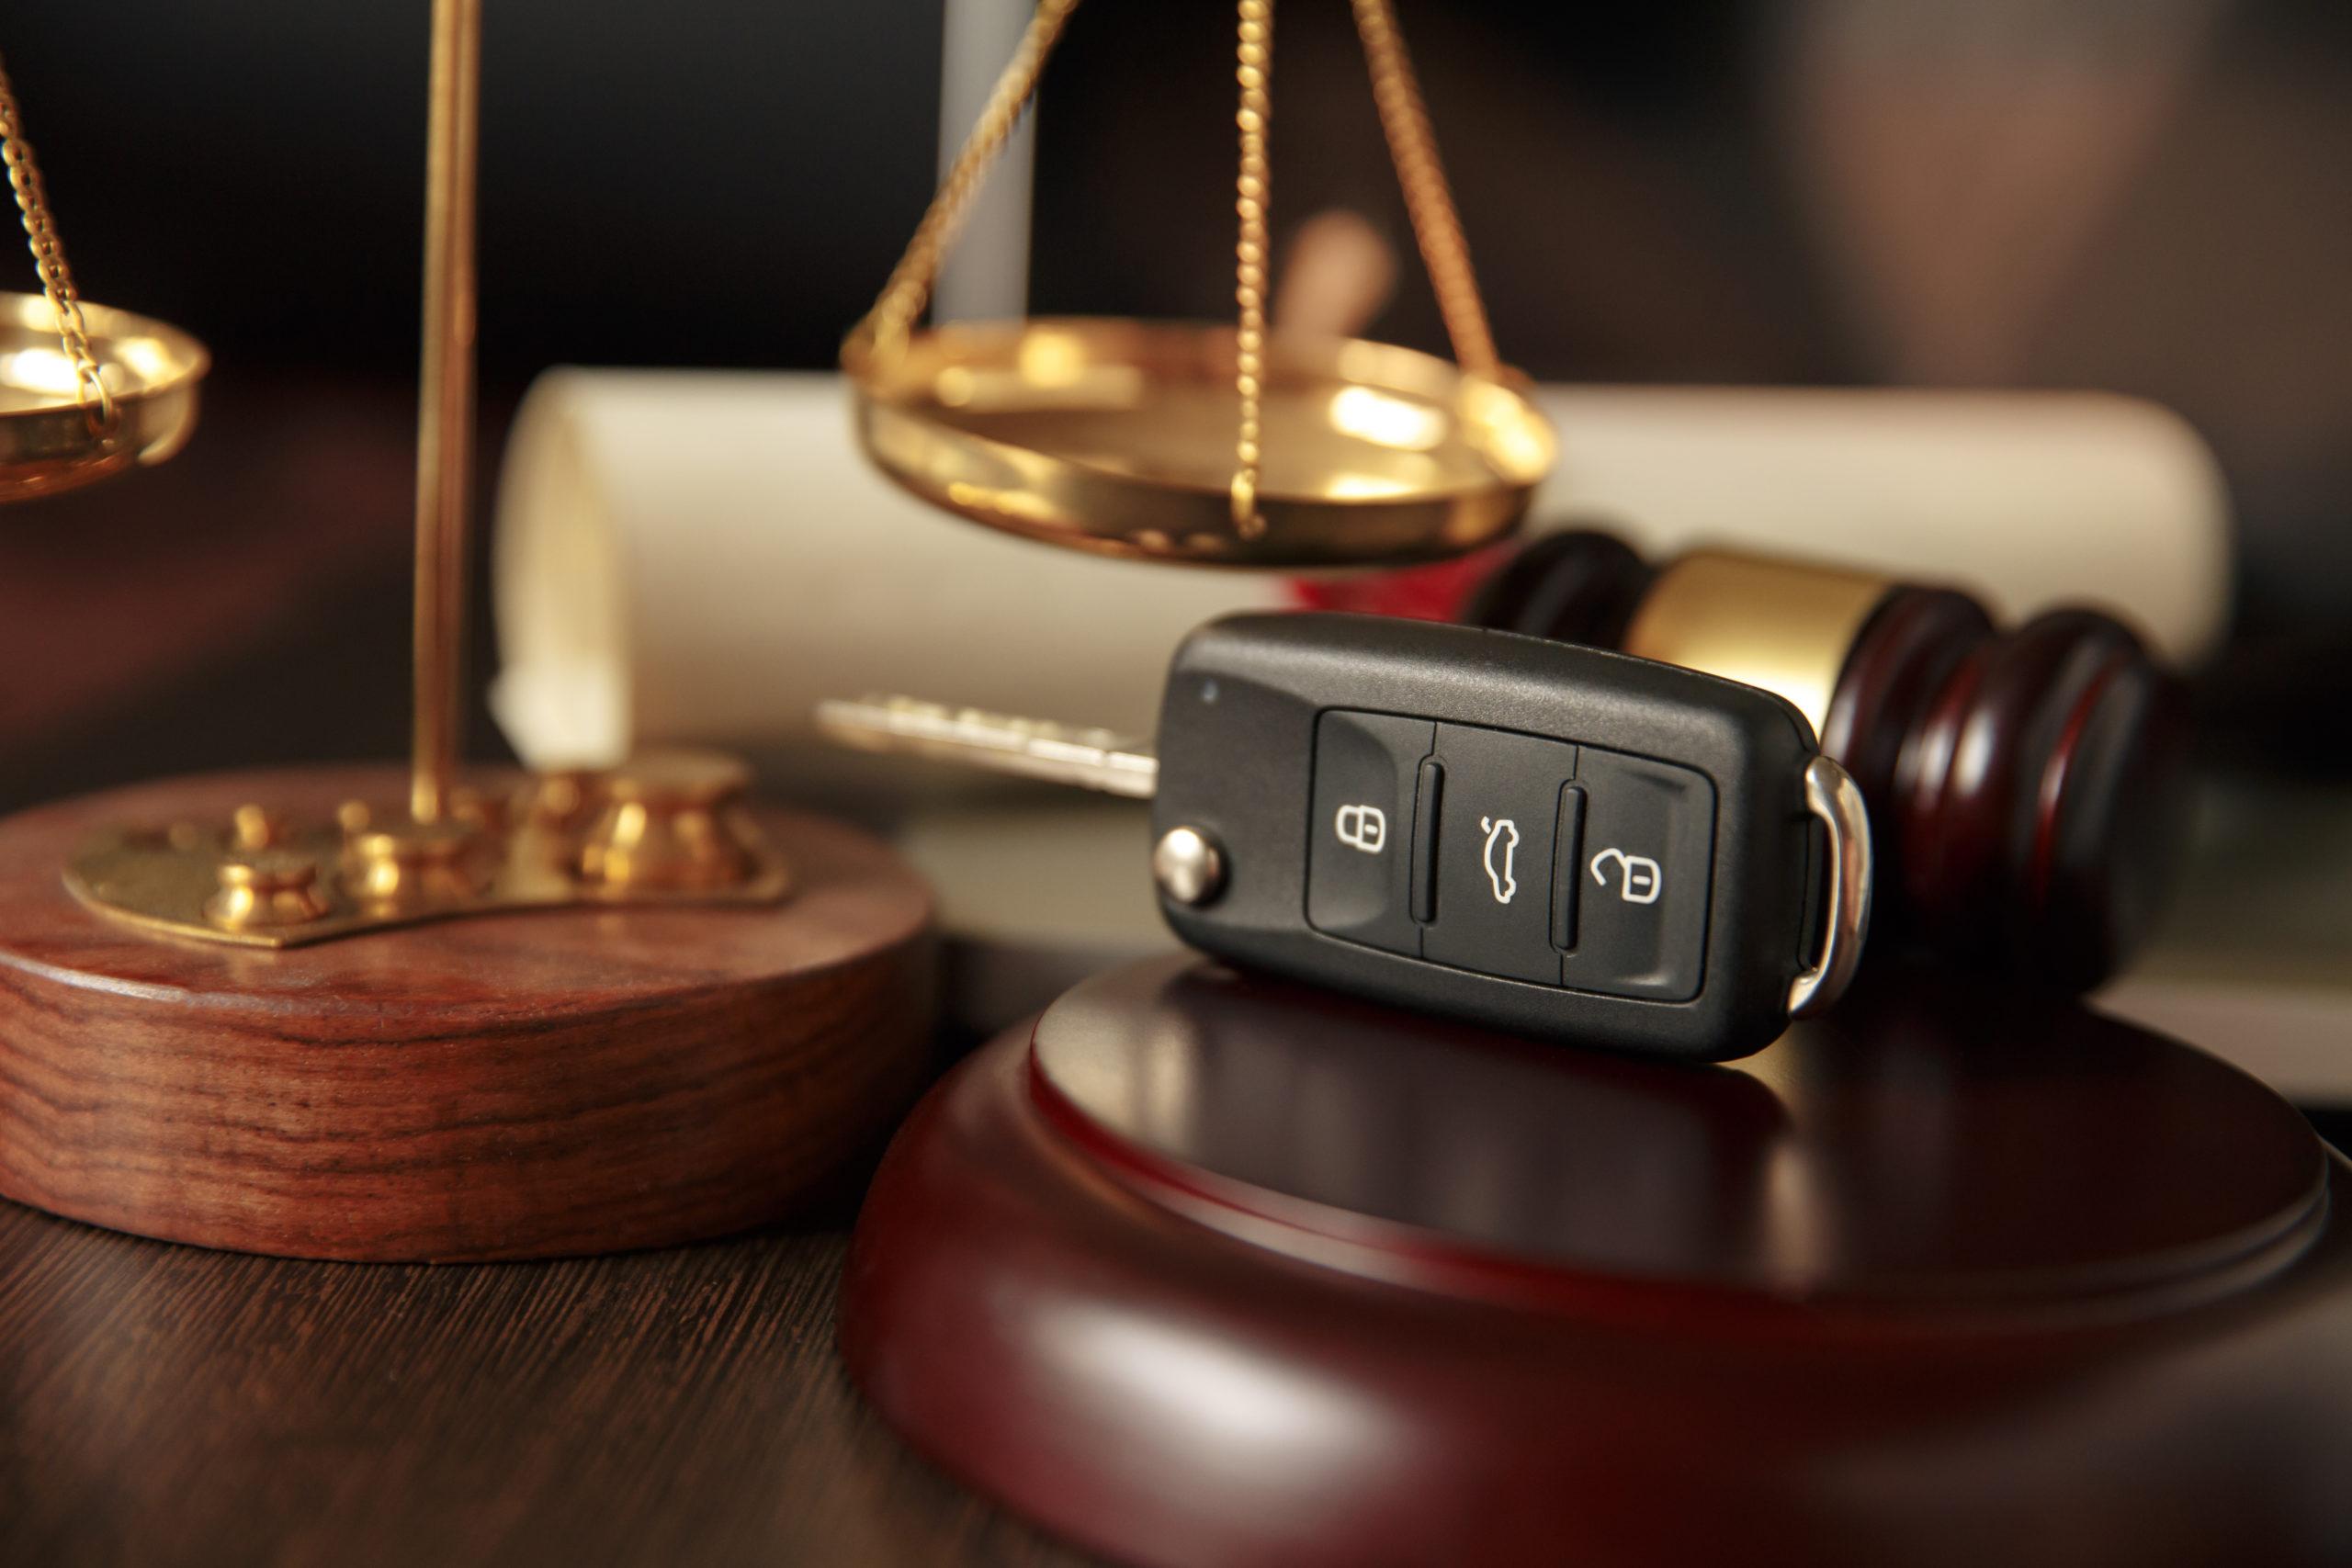 Judicial scales and keys